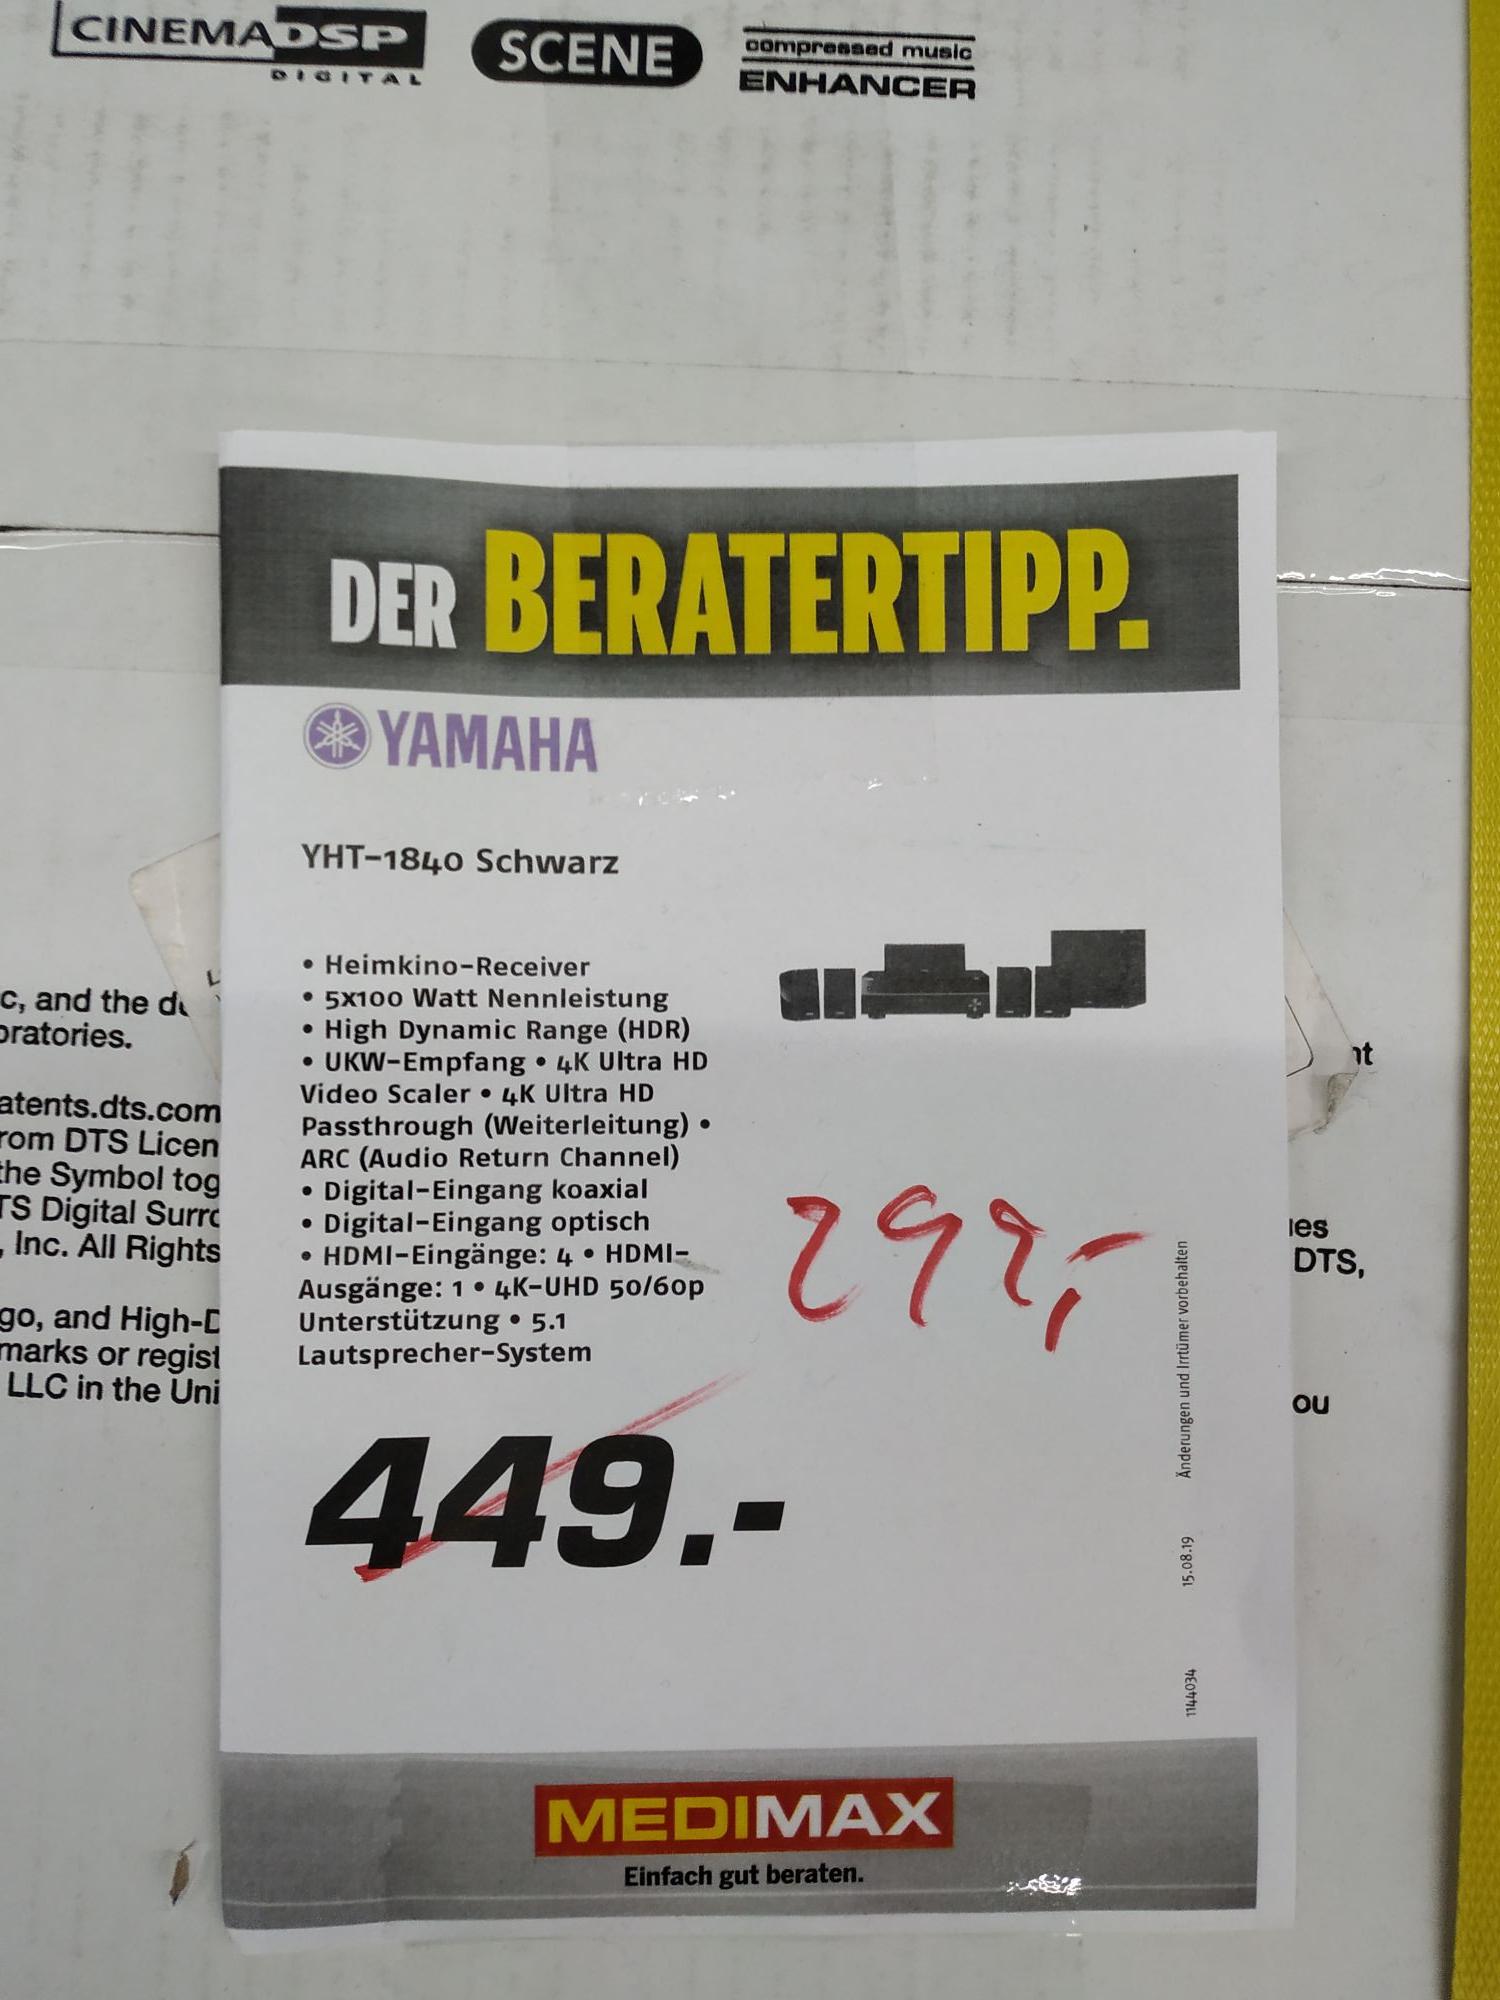 Lokal MediMax Kiel Yamaha YHT-1840 schwarz 5.1 Heimkino System